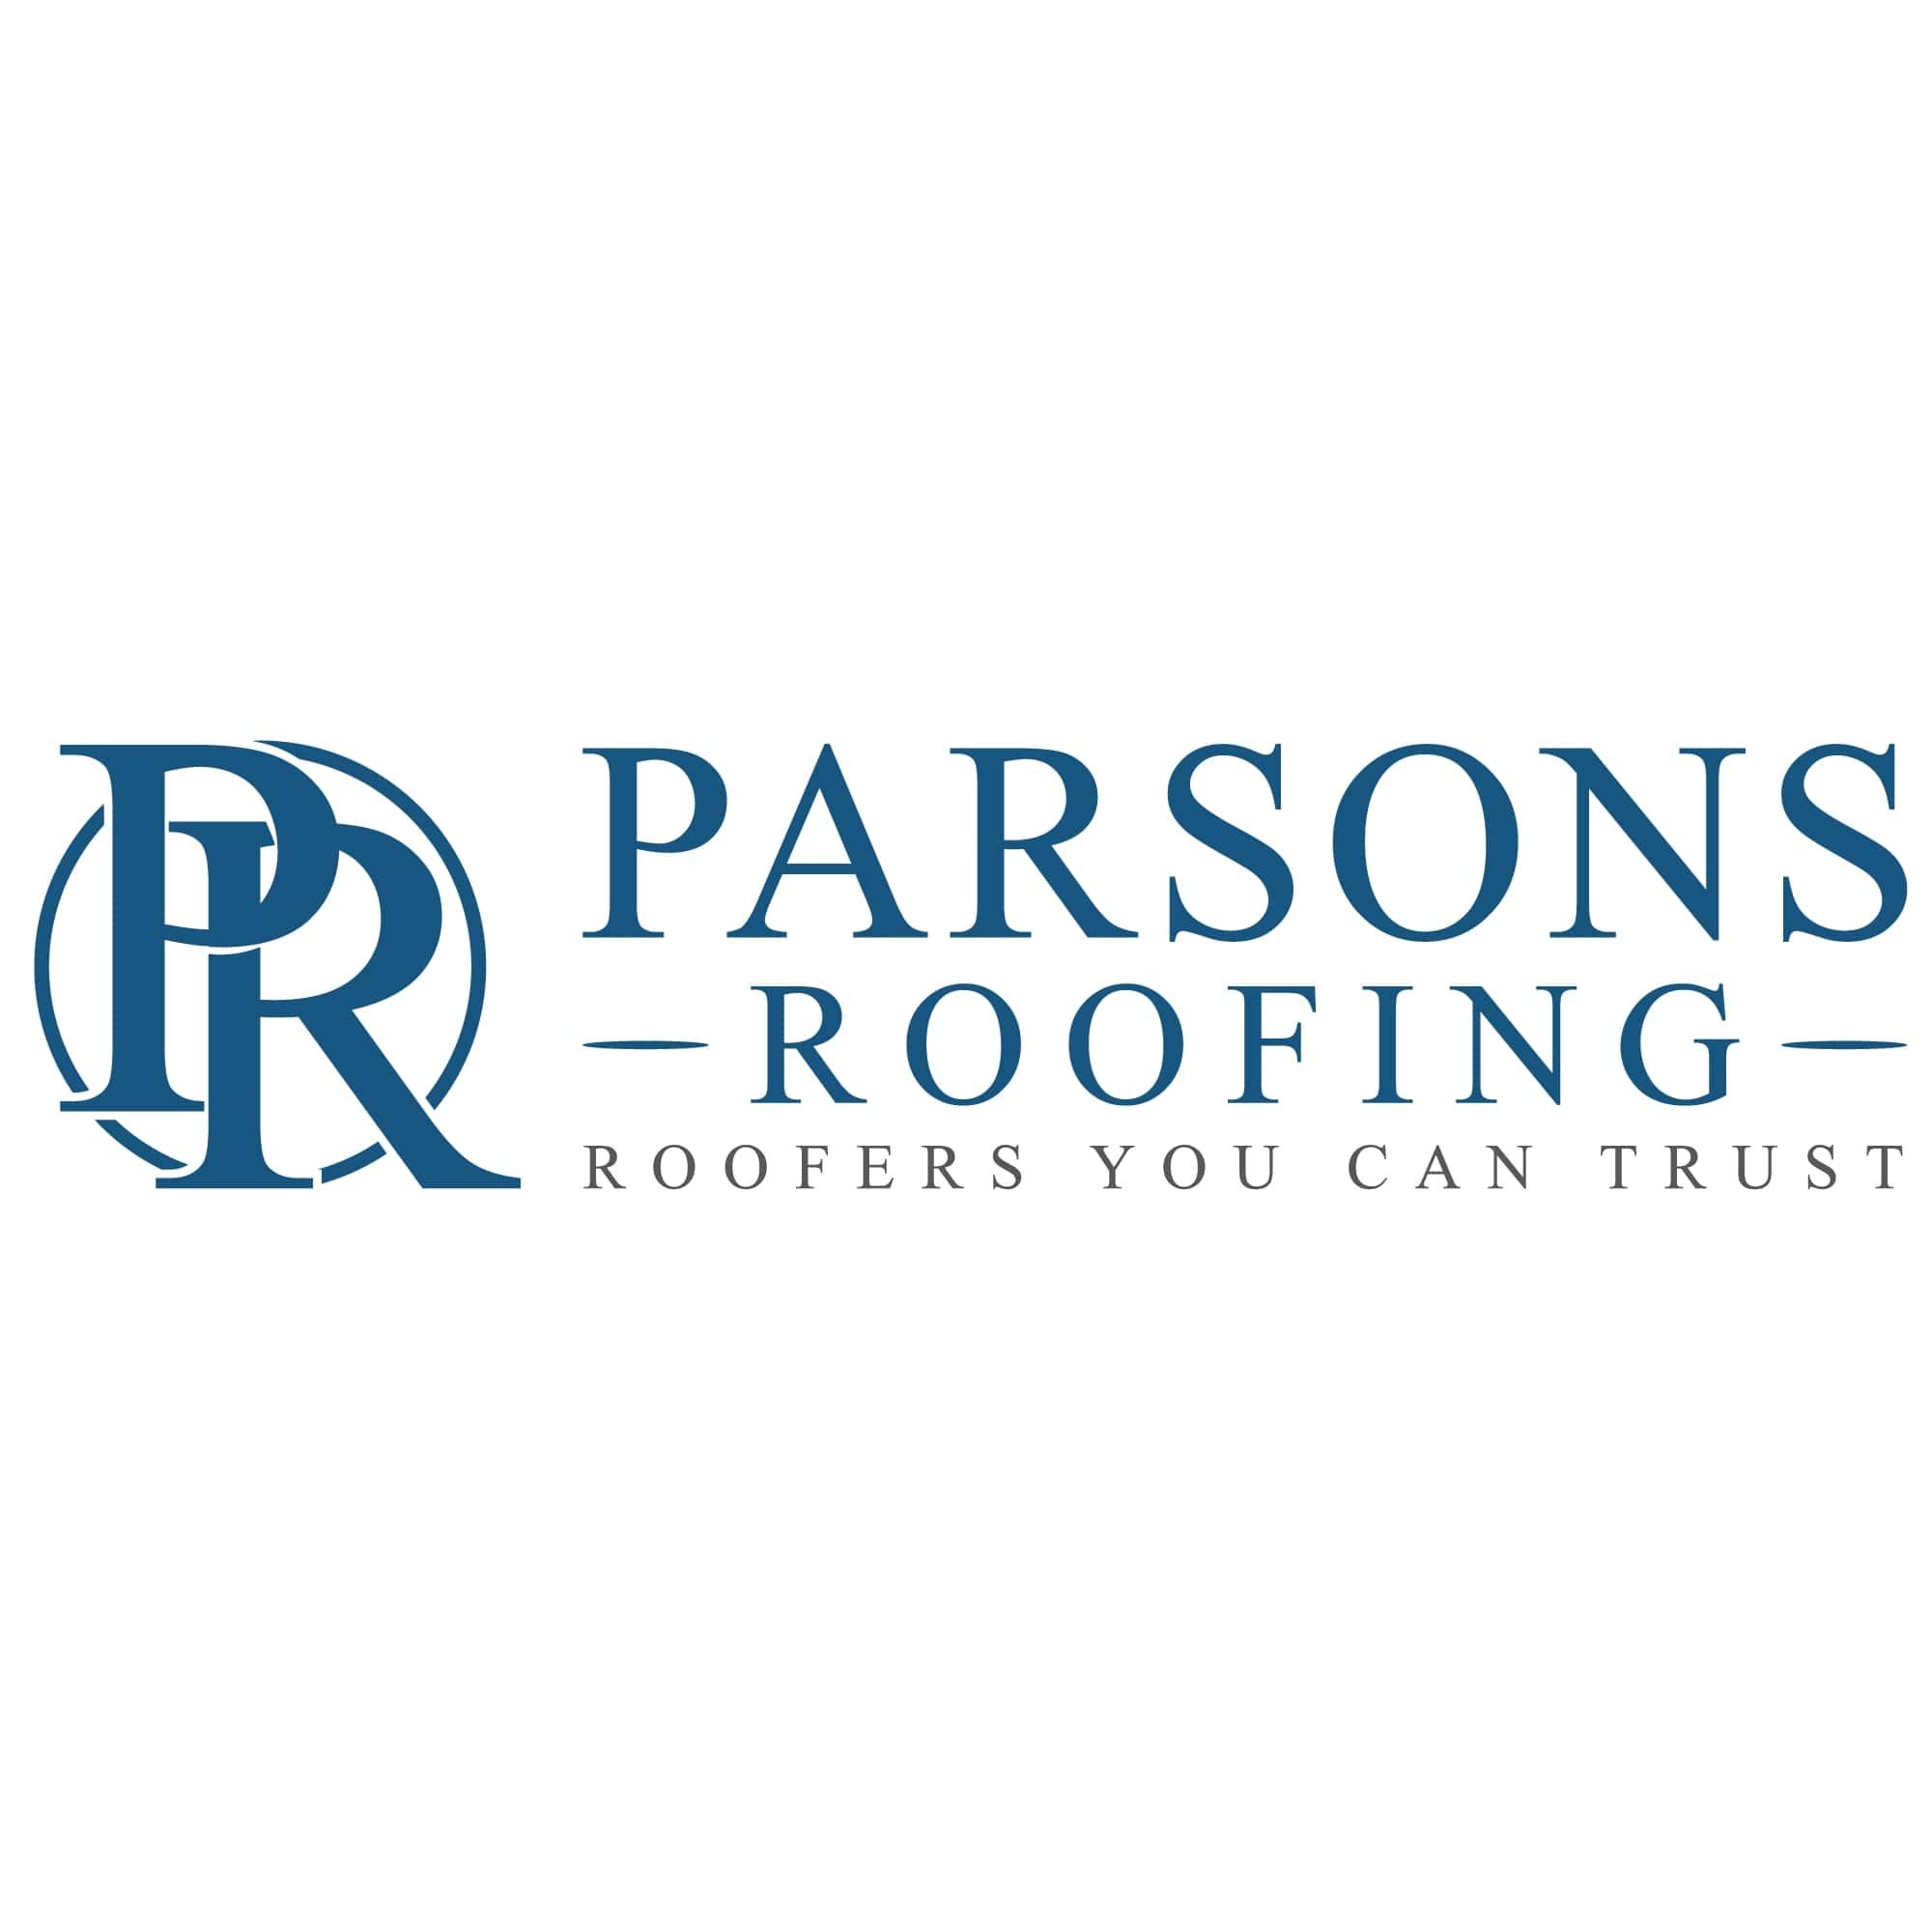 Parsons-Roofing.jpg